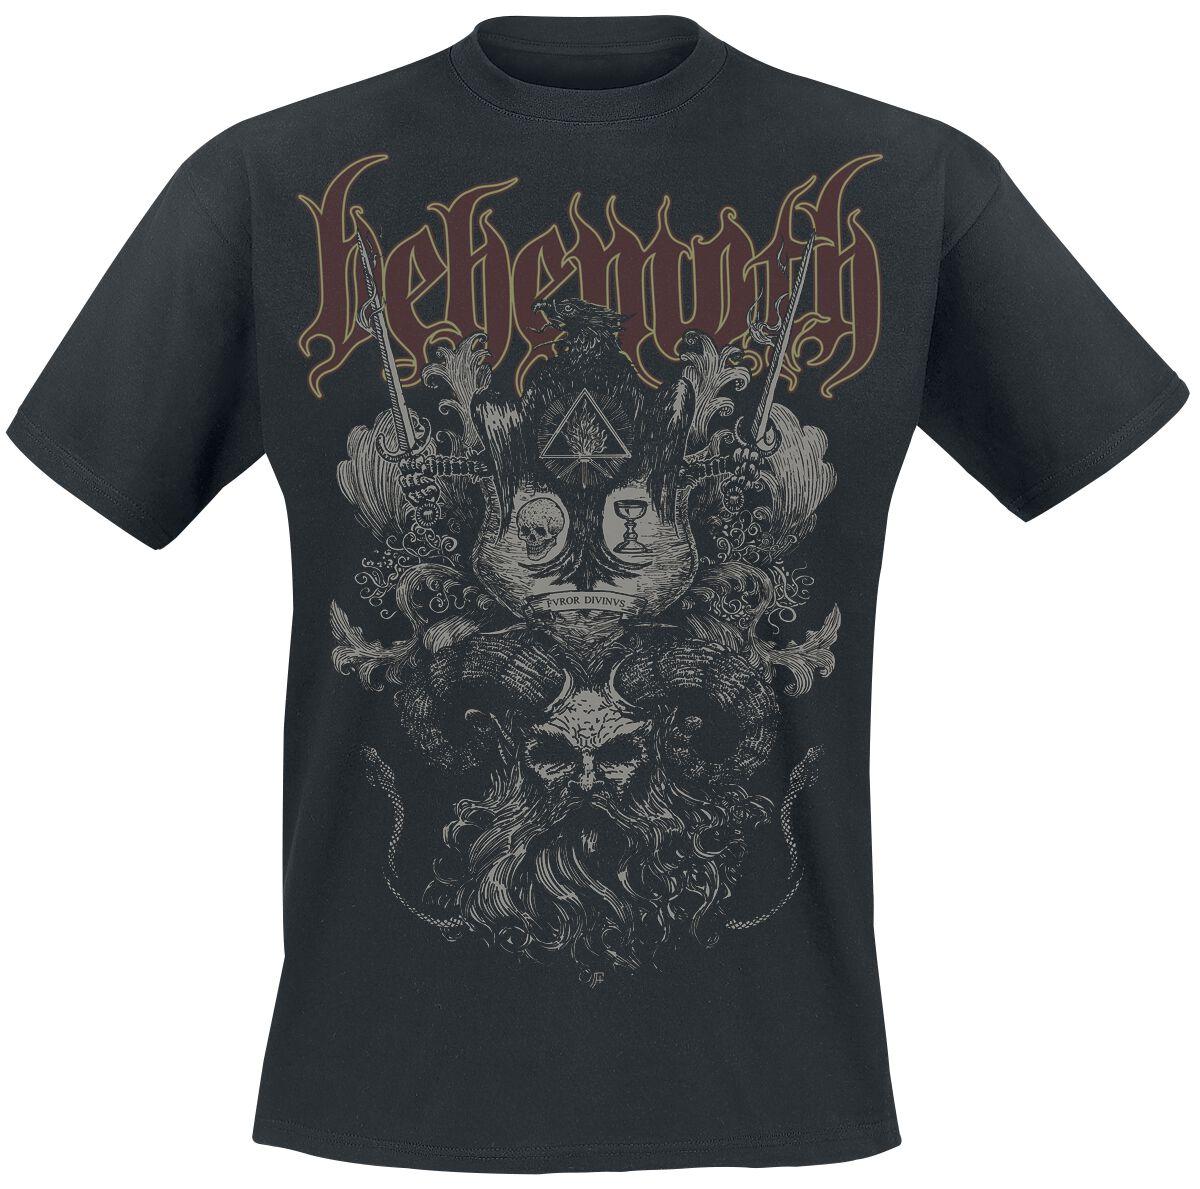 Zespoły - Koszulki - T-Shirt Behemoth Herald T-Shirt czarny - 370735